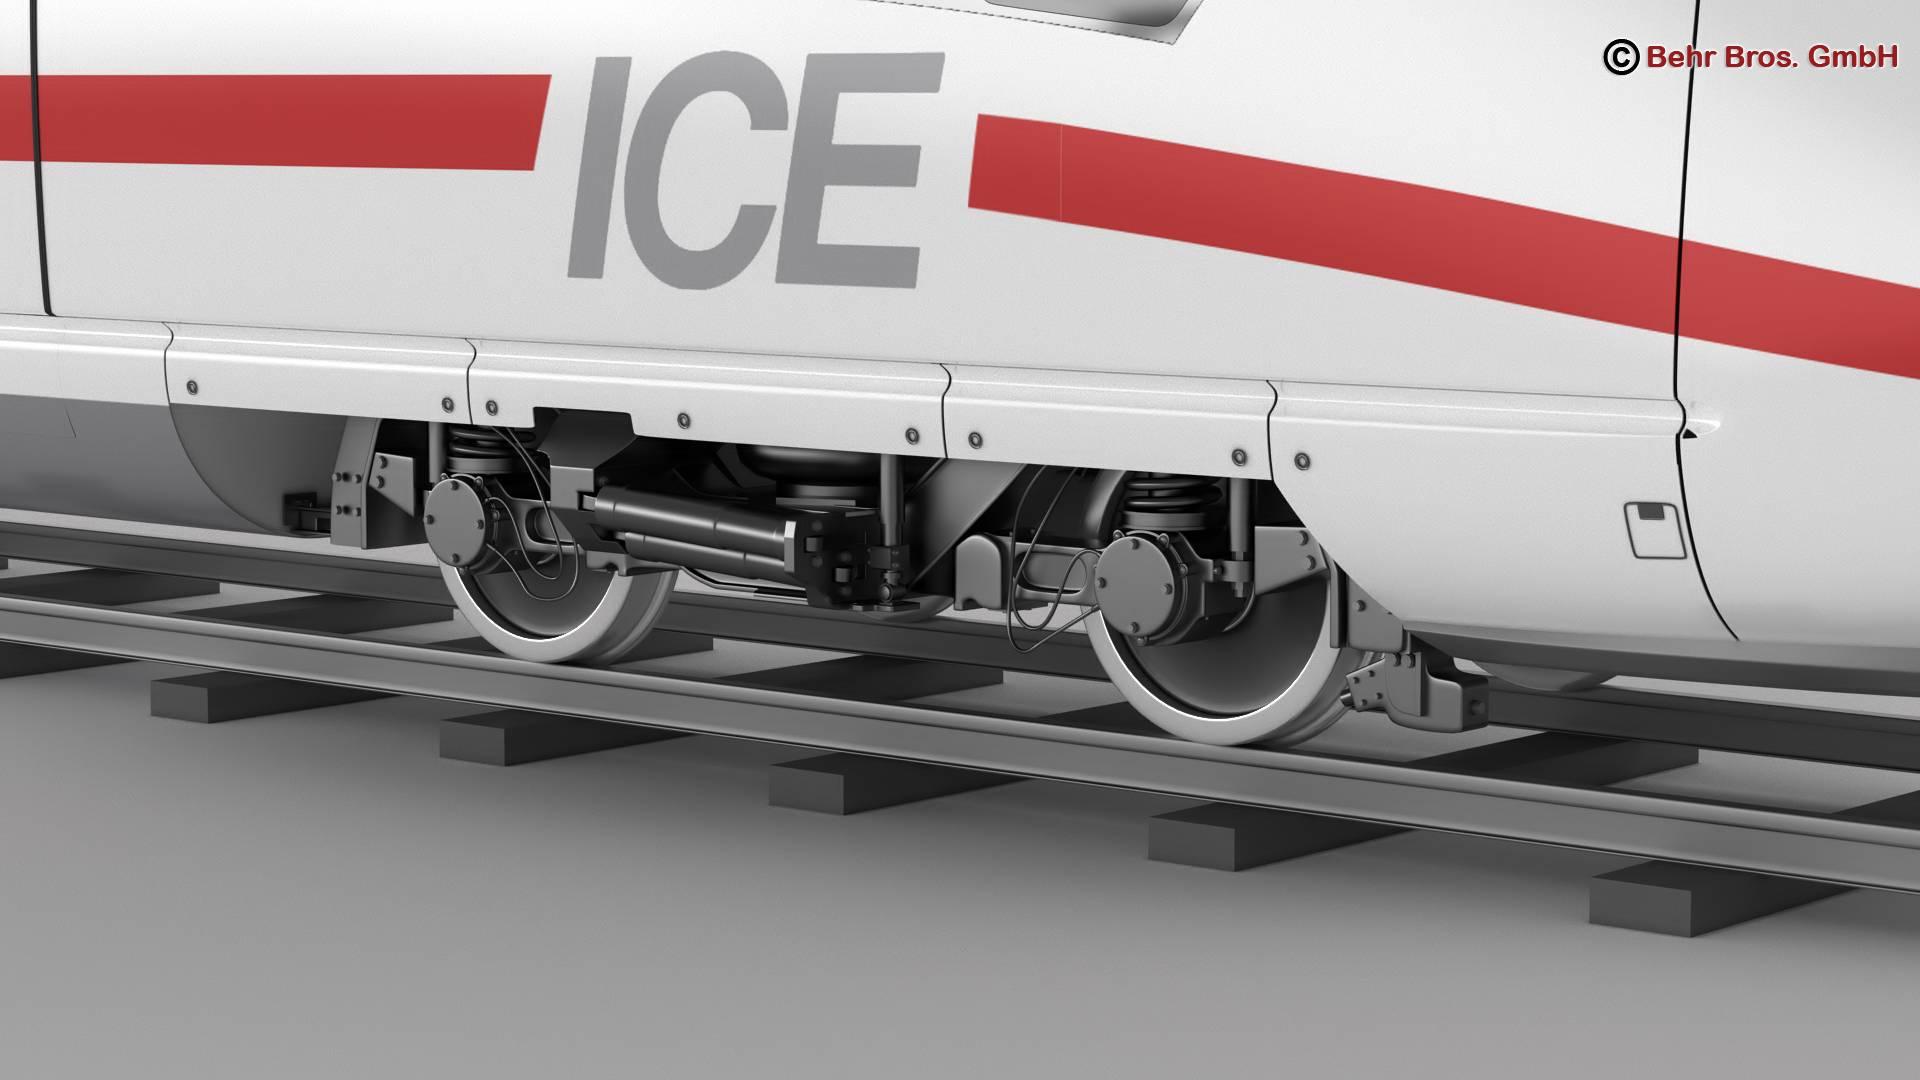 ice 3 br407 3d model 3ds max fbx c4d lwo ma mb obj 220306